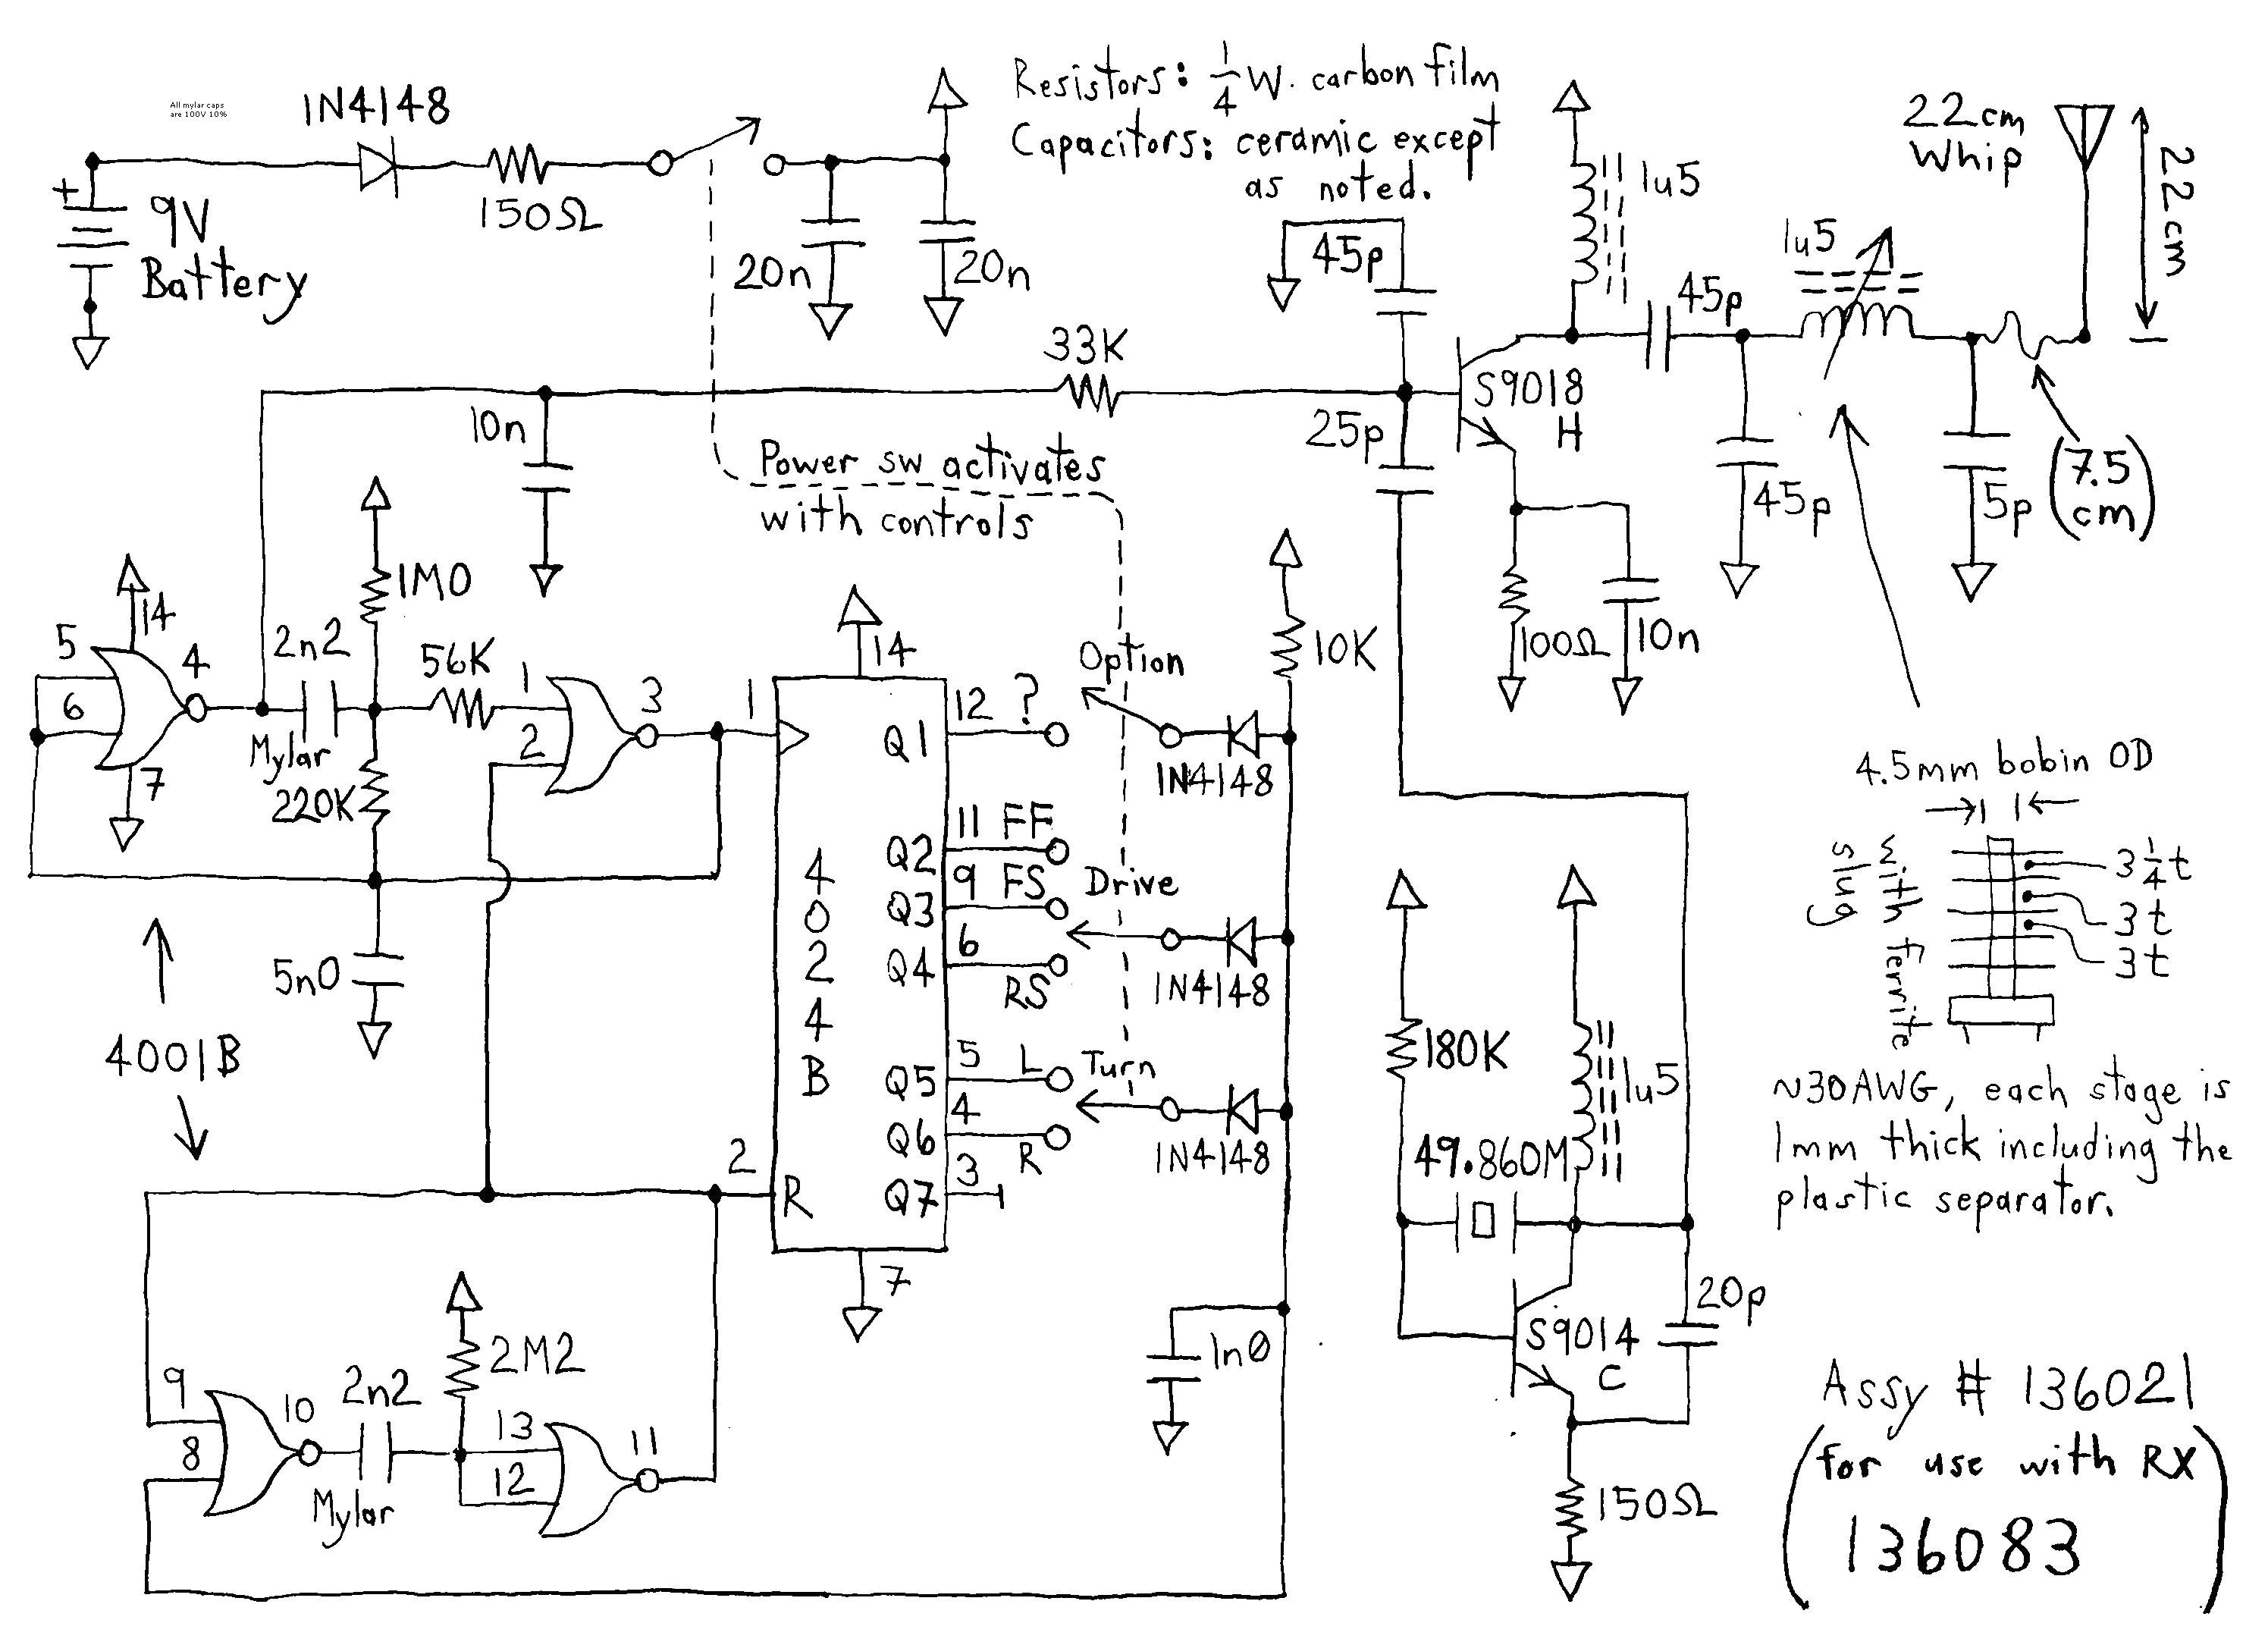 automotive wiring diagram creator wiring diagram perfomance vehicle wiring diagram website automotive wiring diagram website